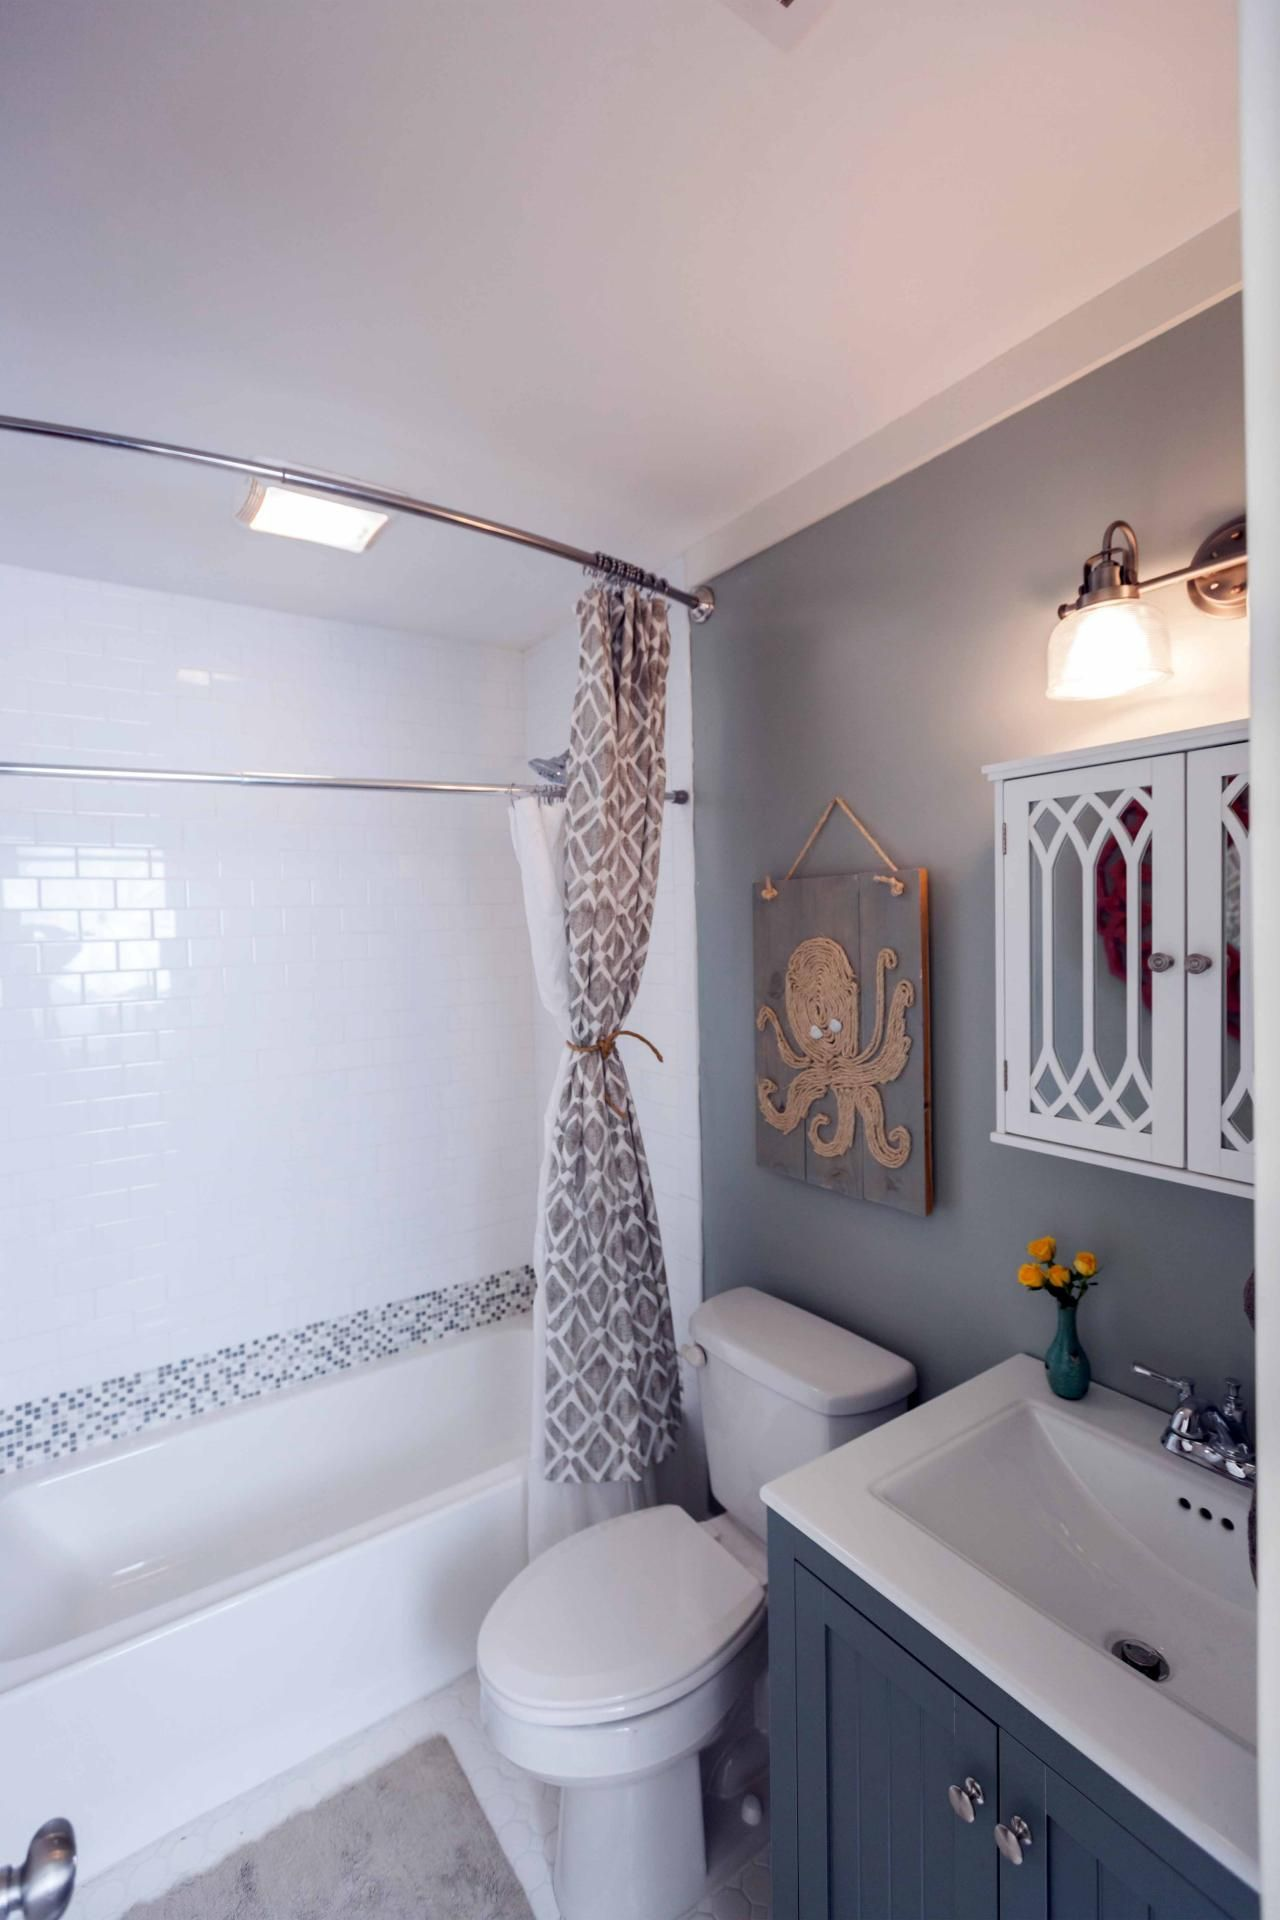 Badezimmer design hd-bilder  small bathroom before and afters  bathroom design  choose floor